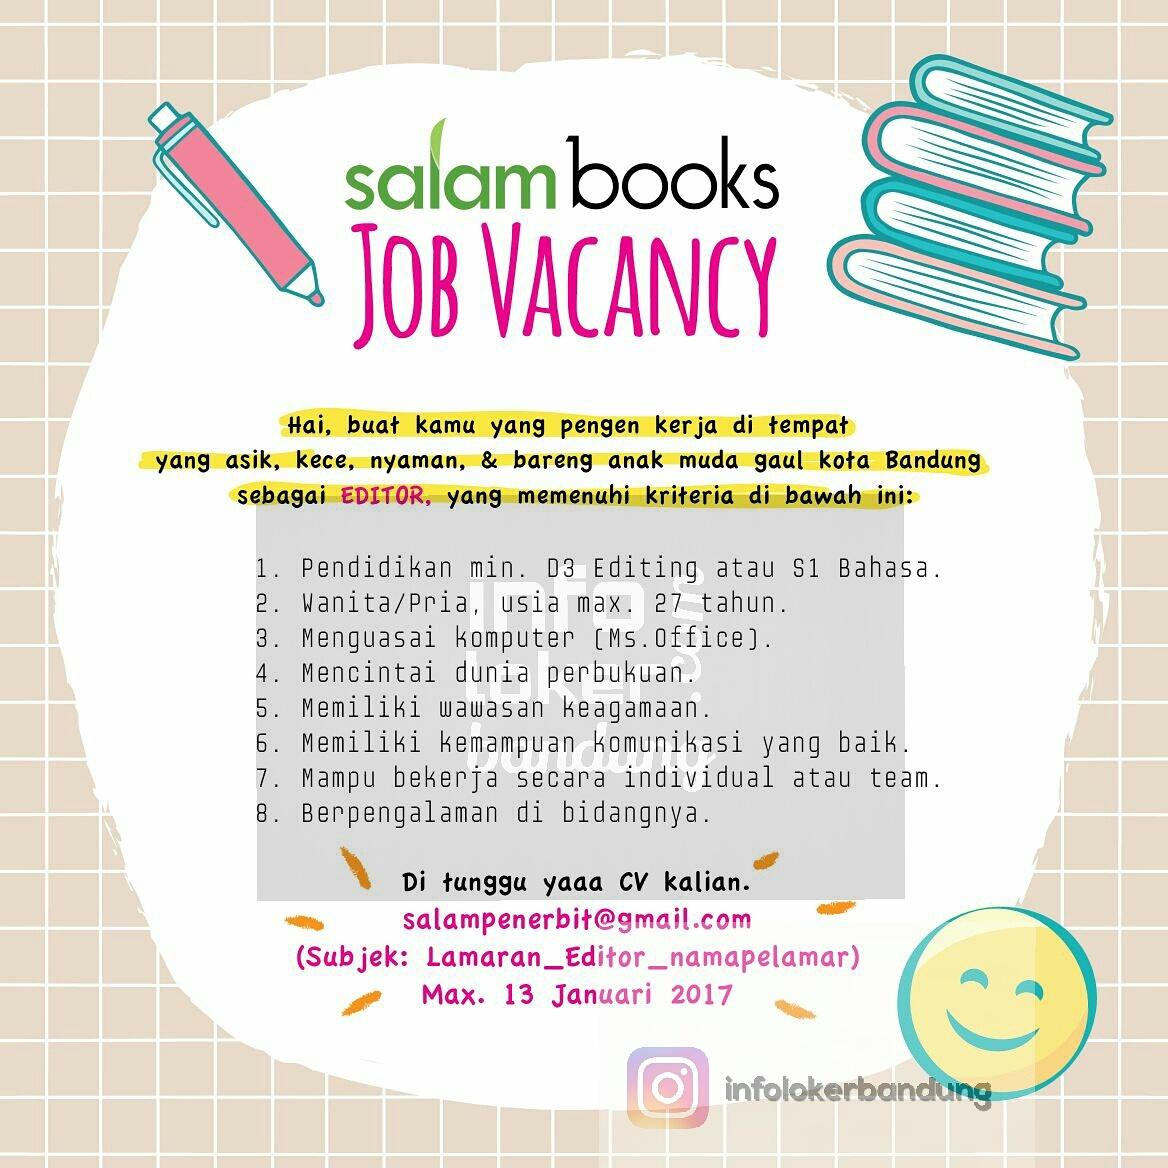 Lowongan Kerja Penerbit Salam Books Bandung Januari 2017